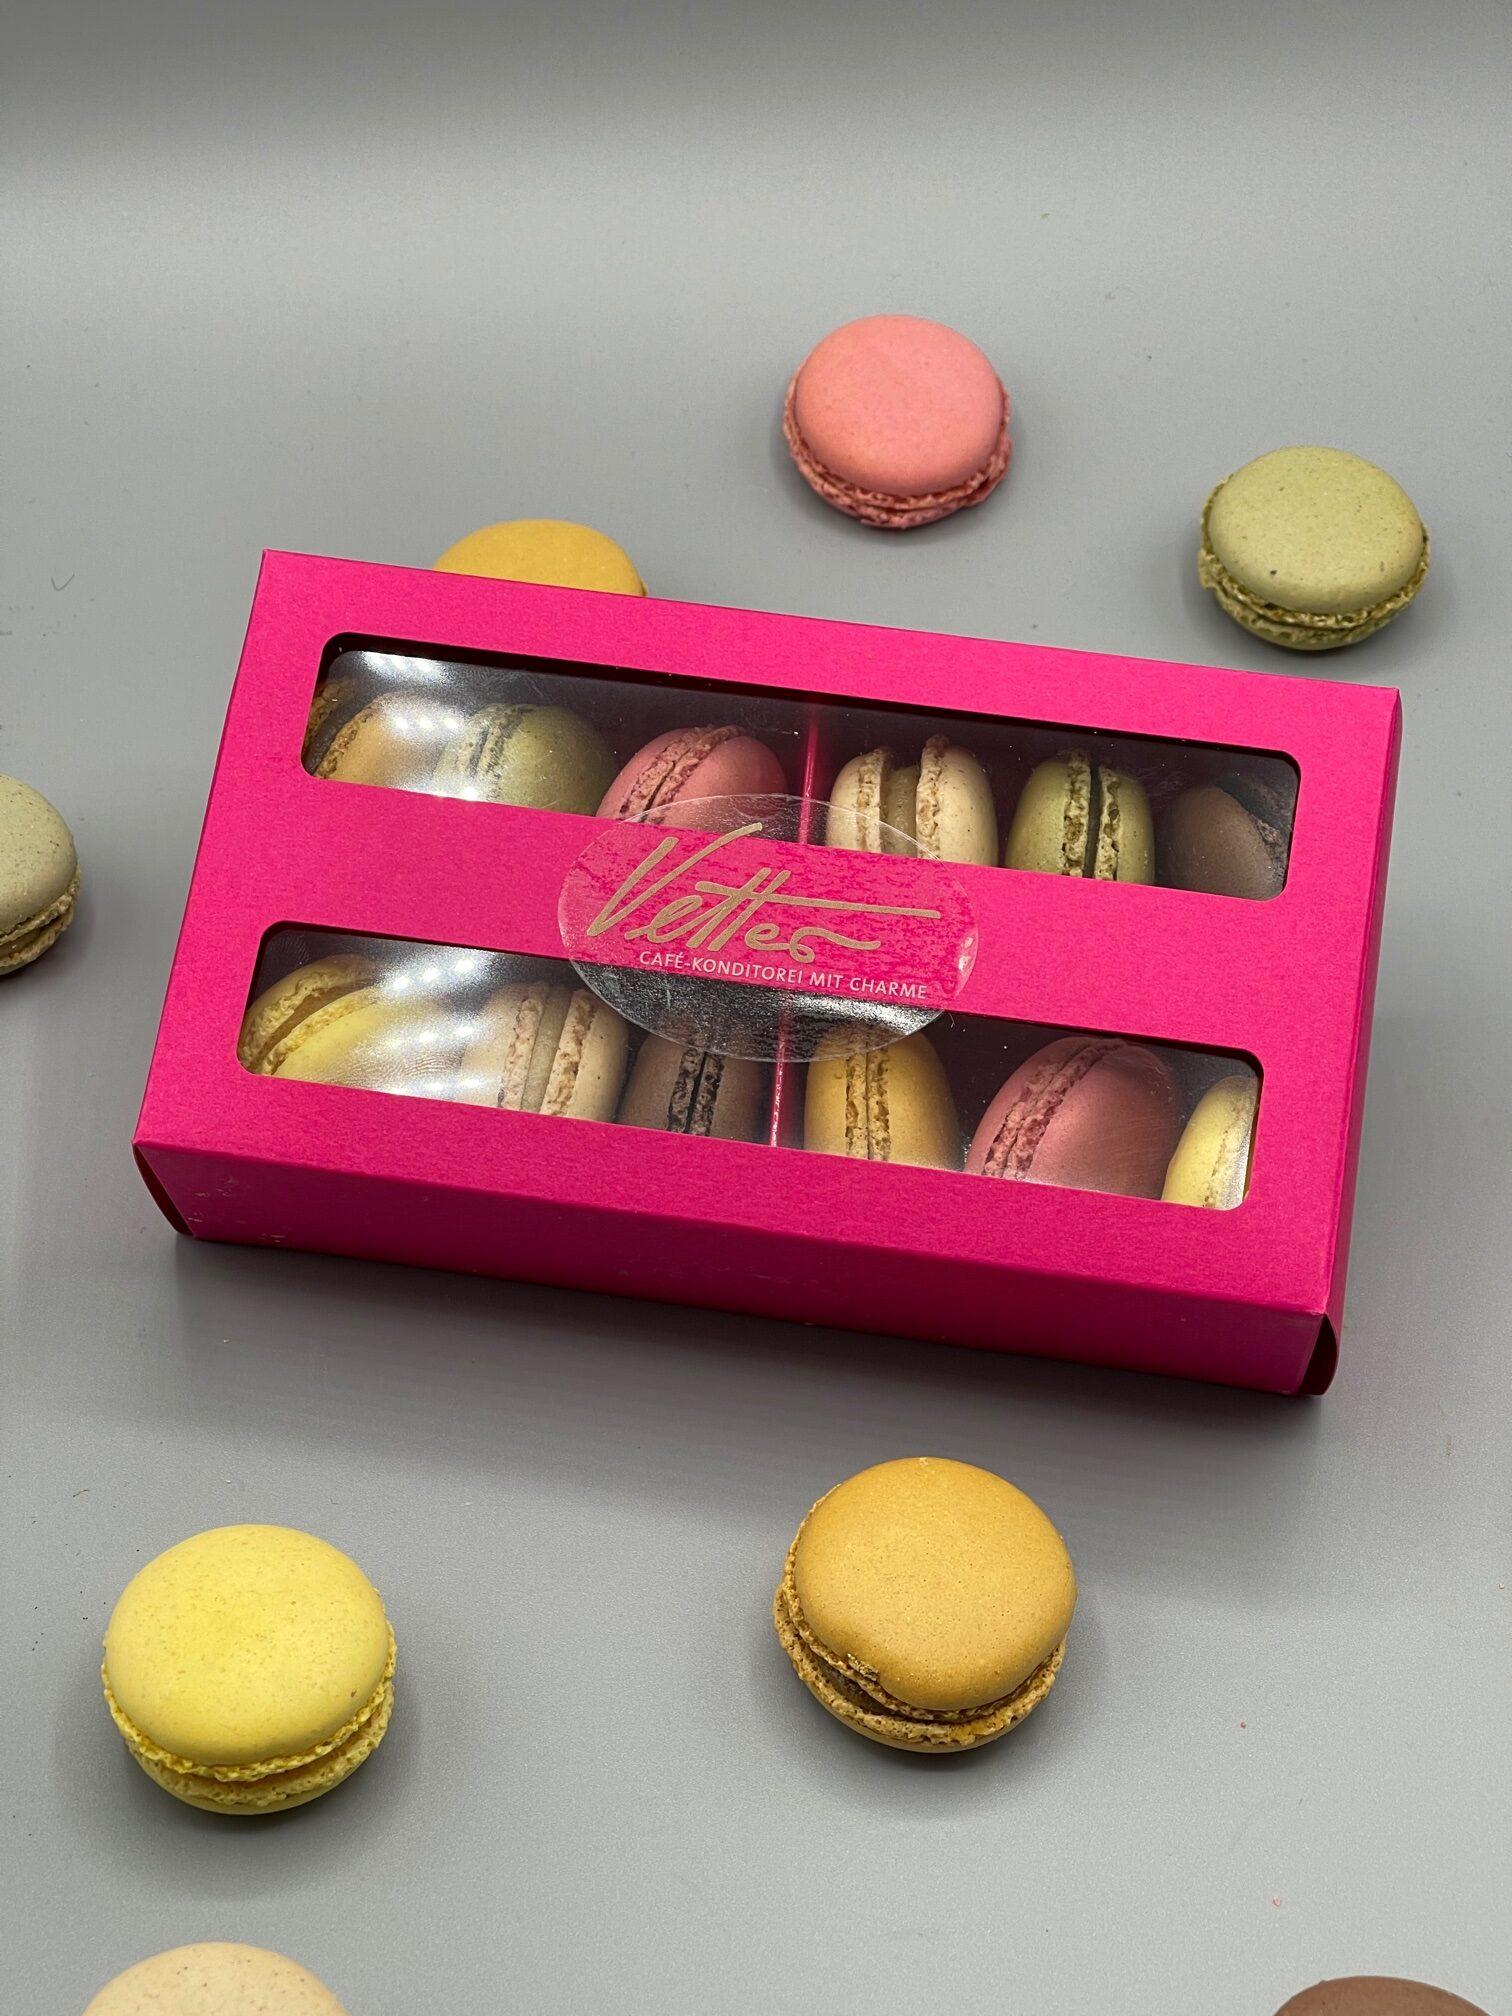 Feinste Macarons In Wunderschöner Präsentverpackung 12 Stück